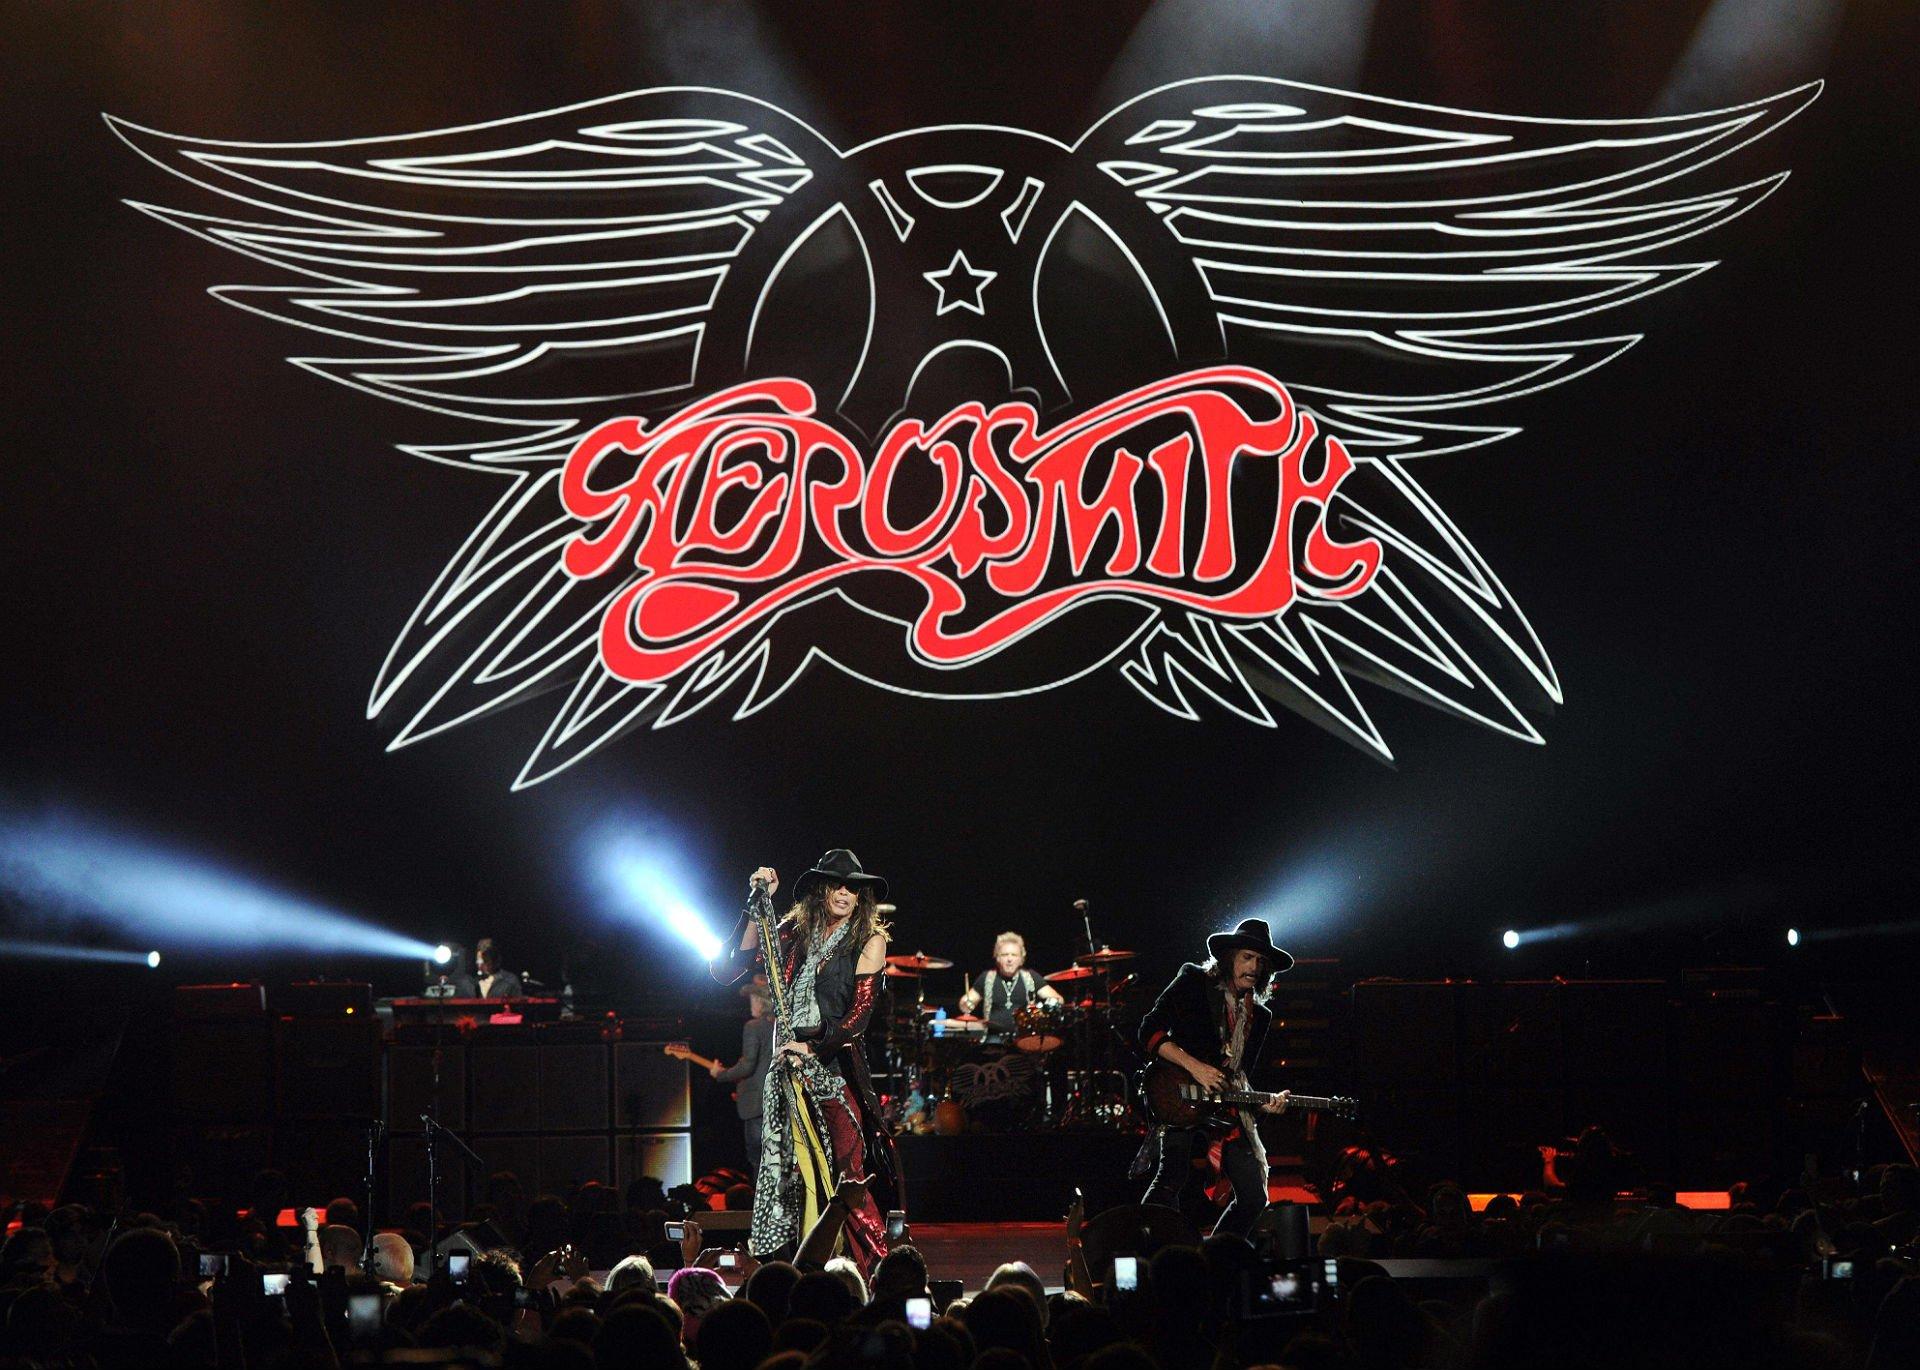 AEROSMITH hard rock glam heavy metal glam concert ...